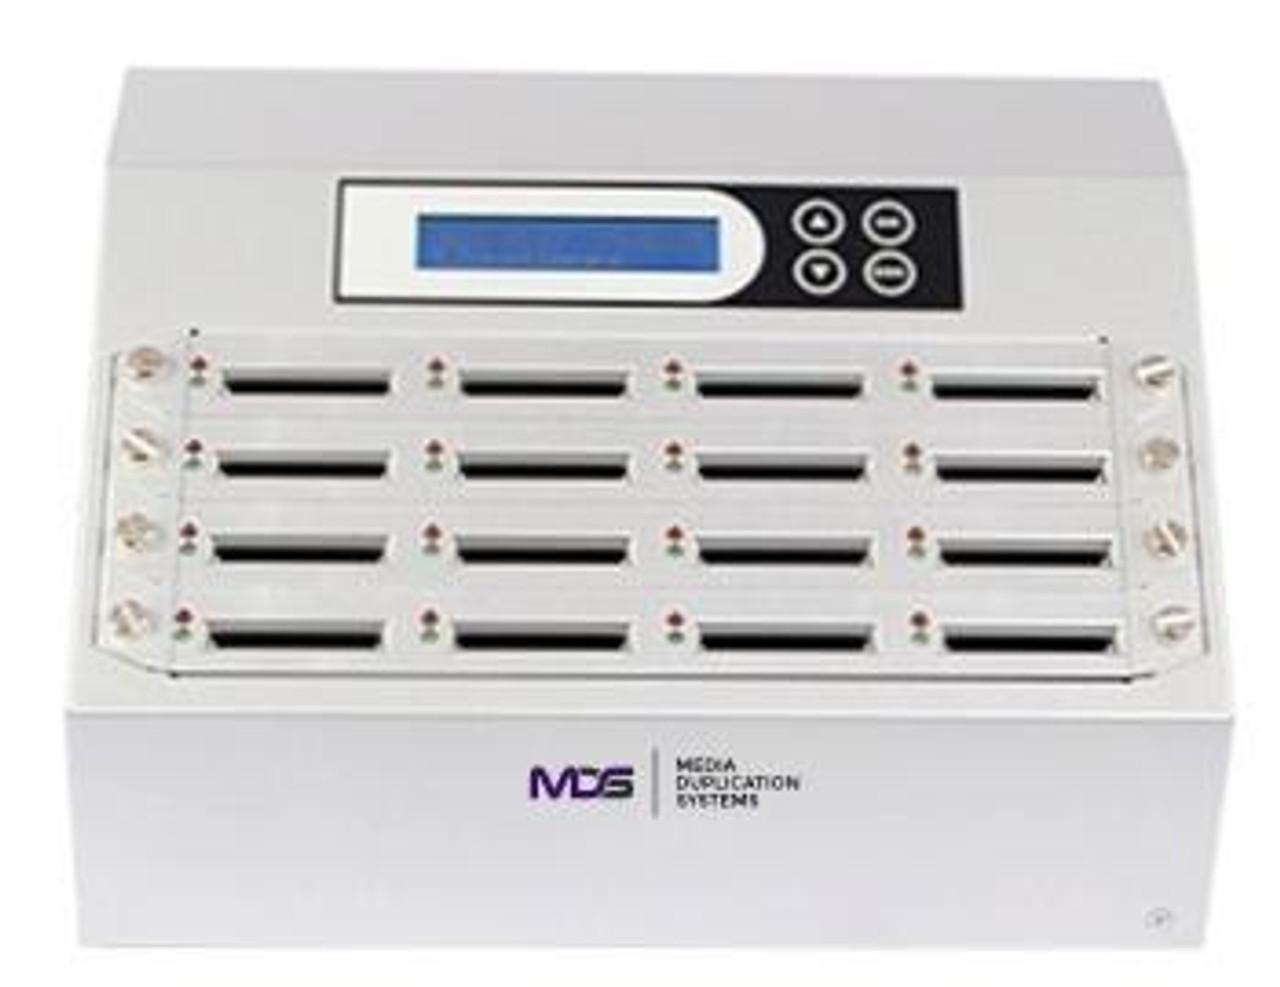 DupliCF CompactFlash Memory Card Duplicator and Eraser